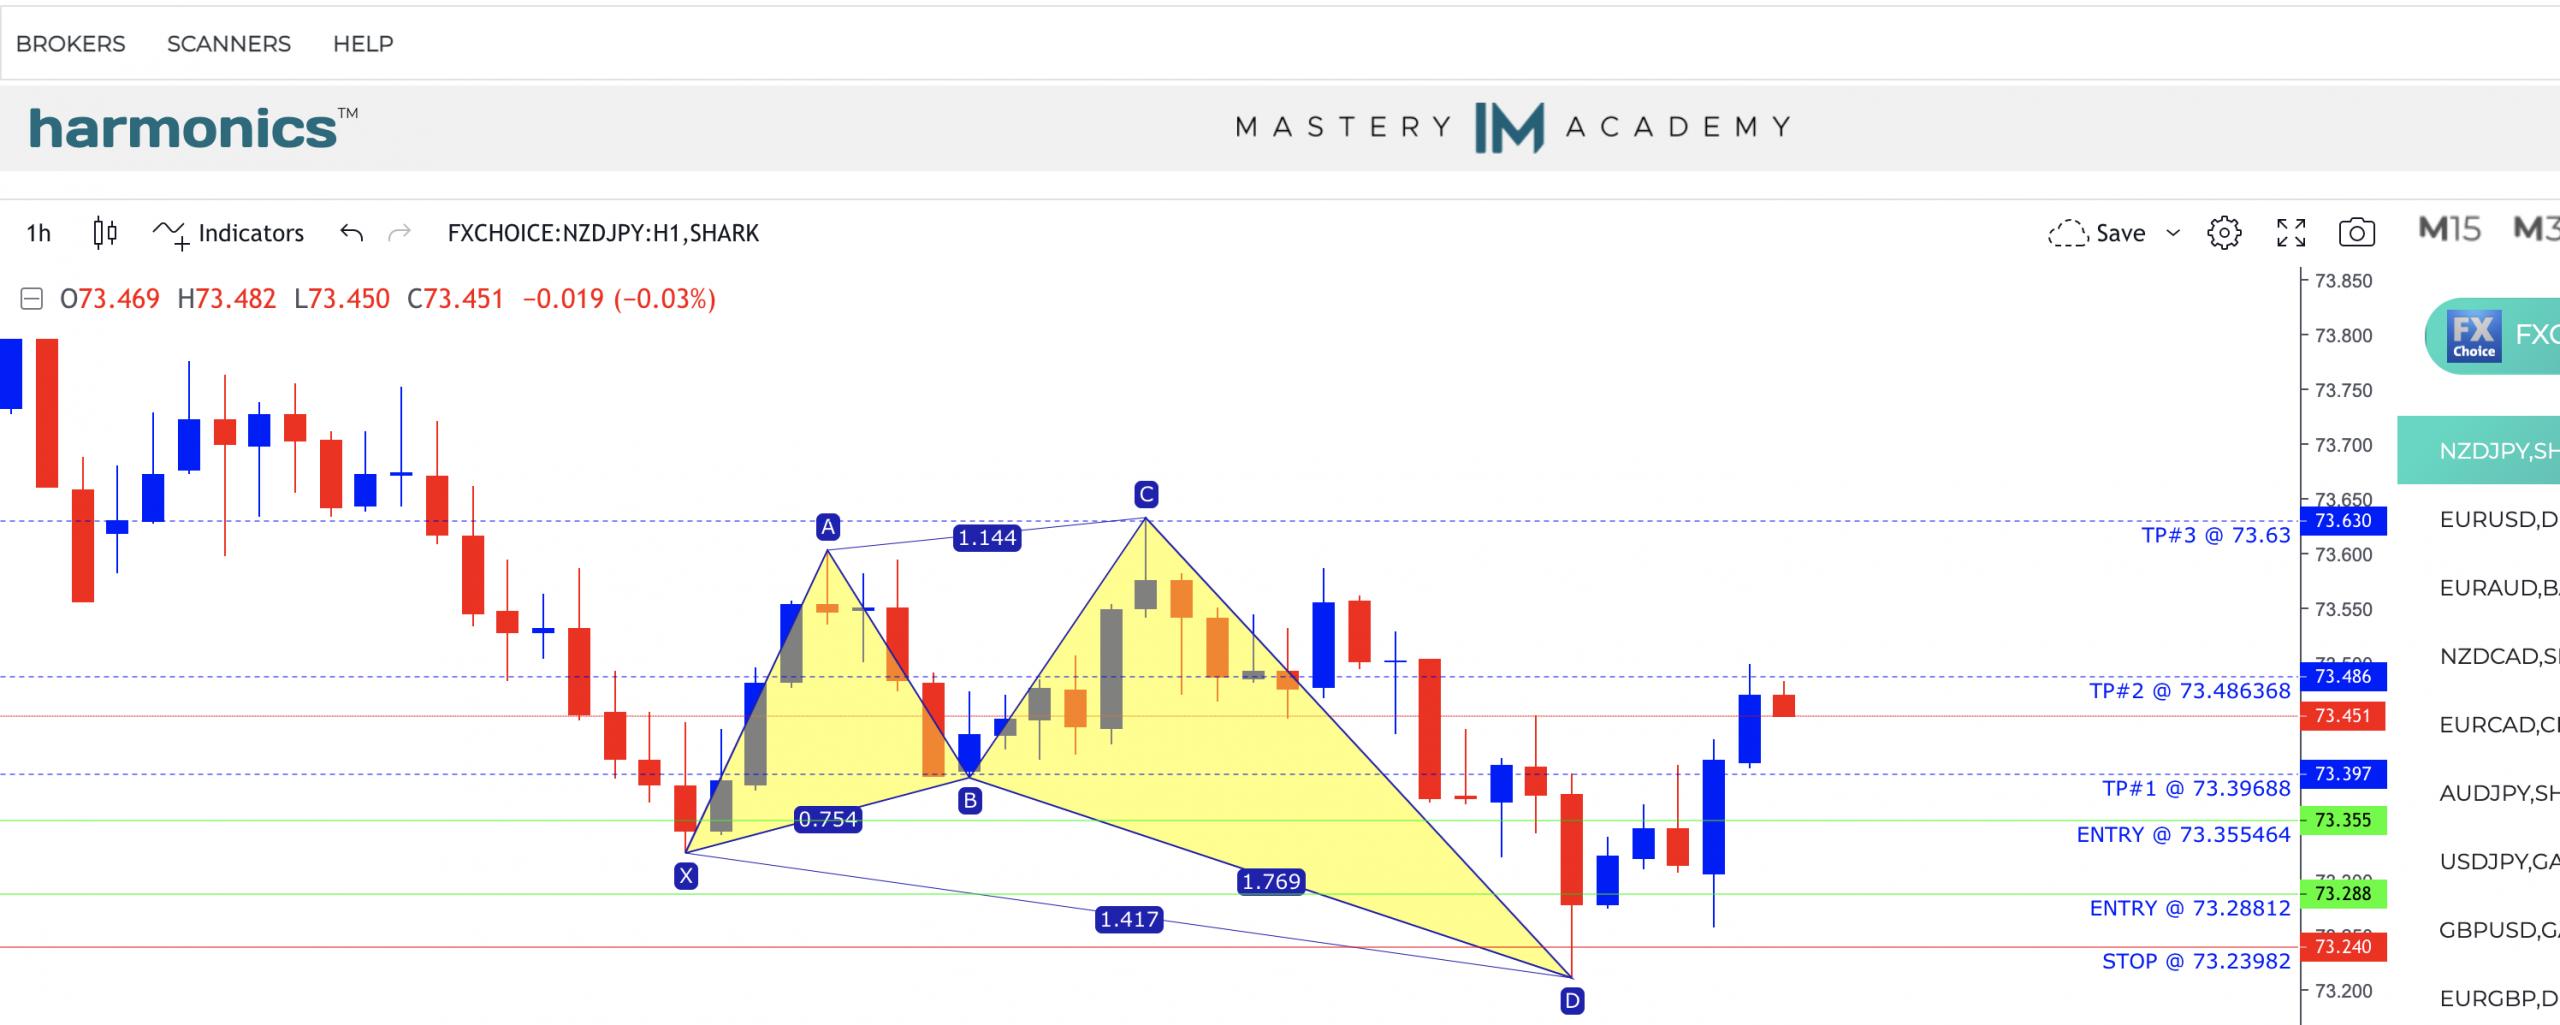 Price Trap Strategy Using IM Harmonics Scanner